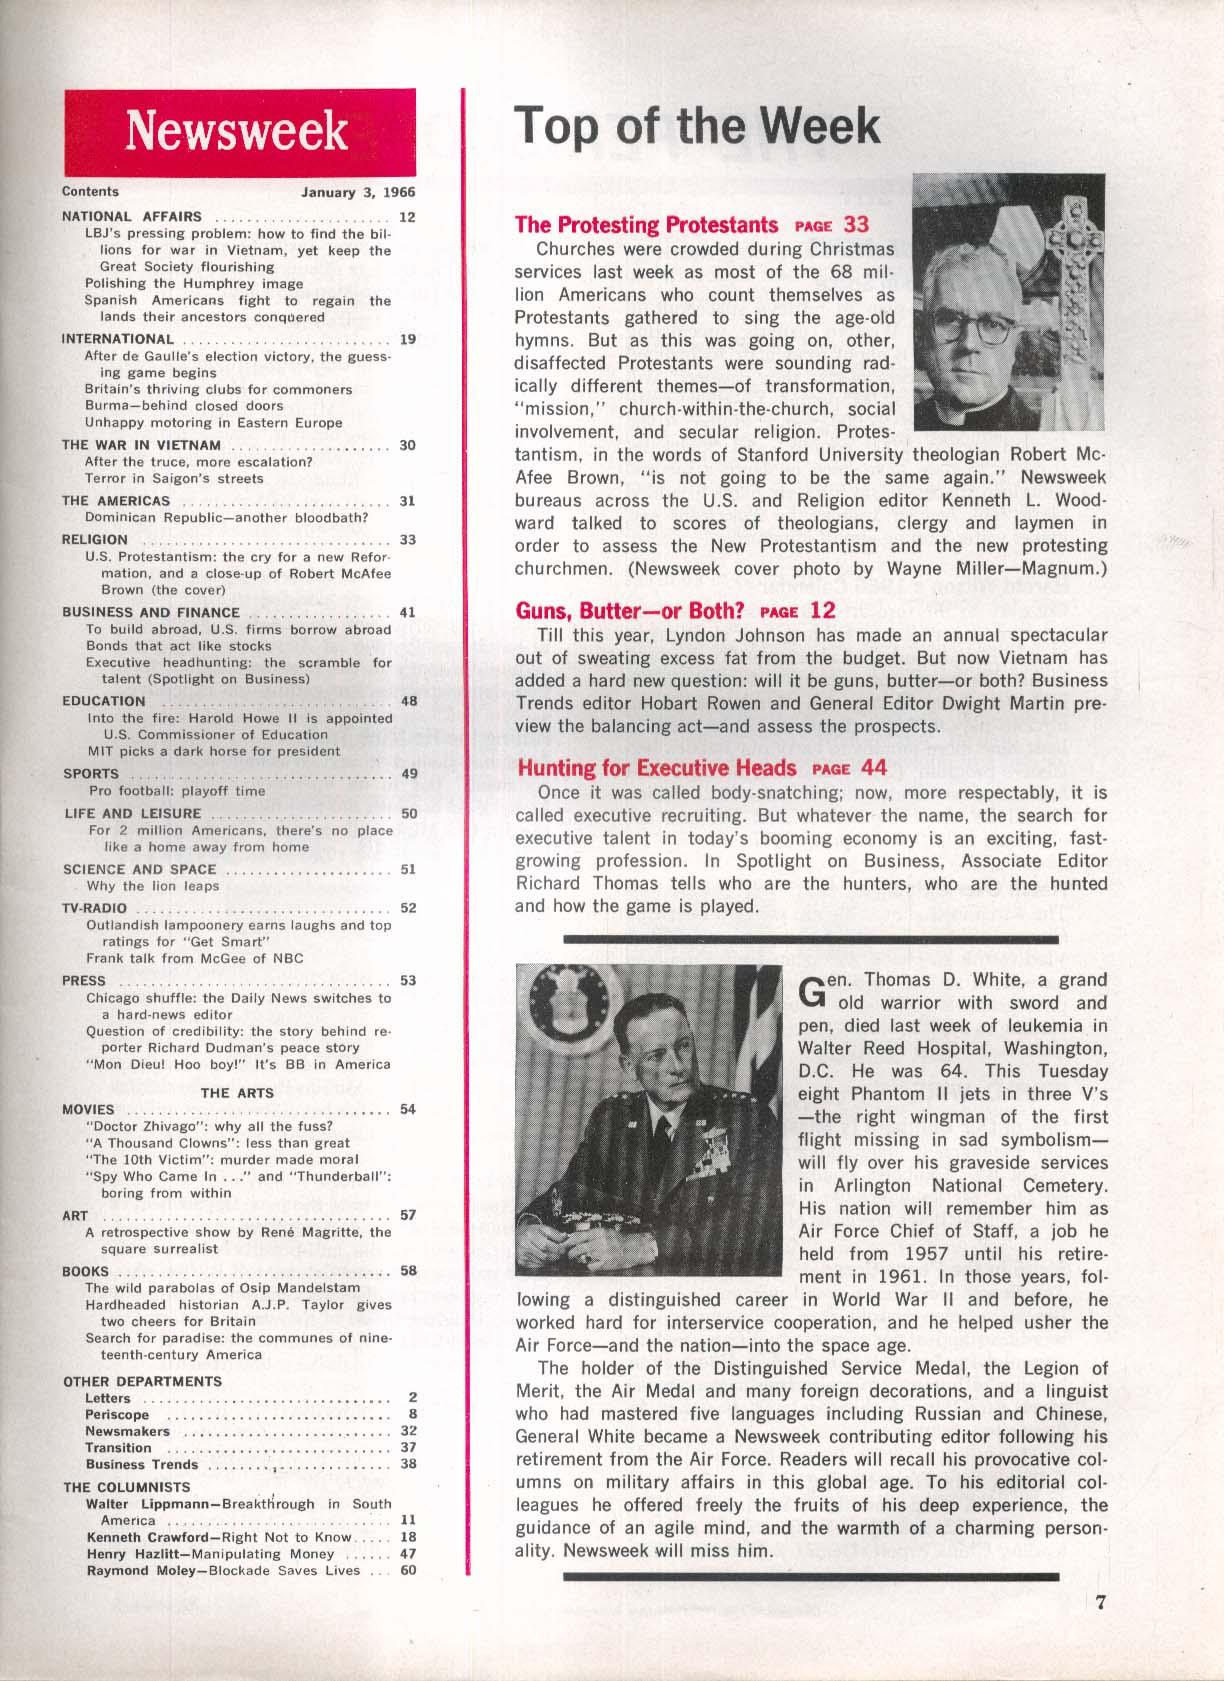 NEWSWEEK Stanford Protestant Robert MacAfee Brown LBJ Vietnam Humphrey 1/3 1966